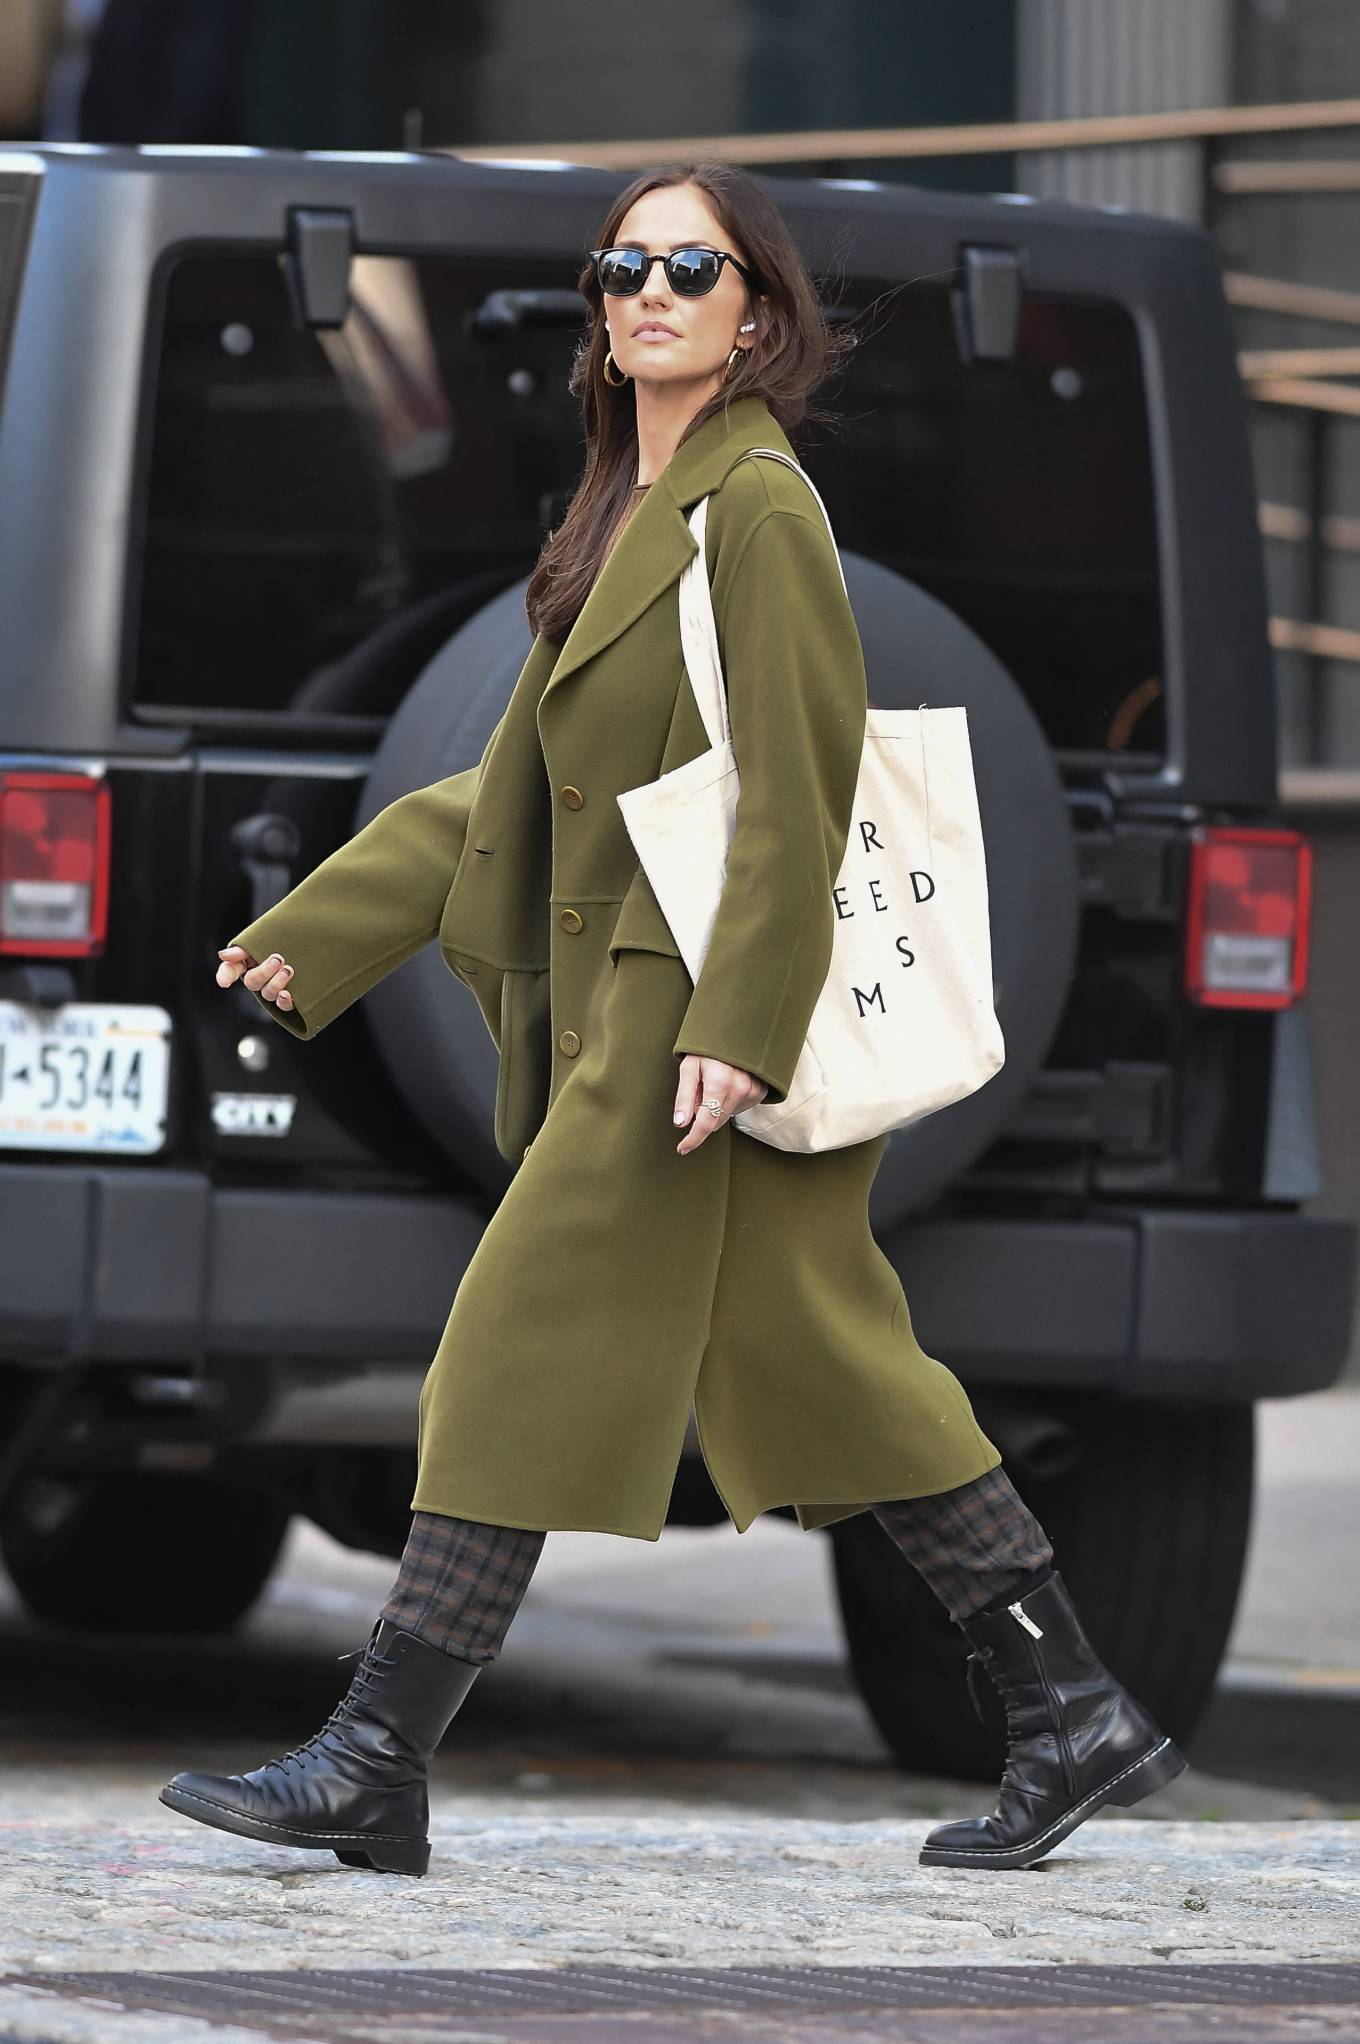 Minka Kelly 2021 : Minka Kelly – In olive green runs errands in New York-31